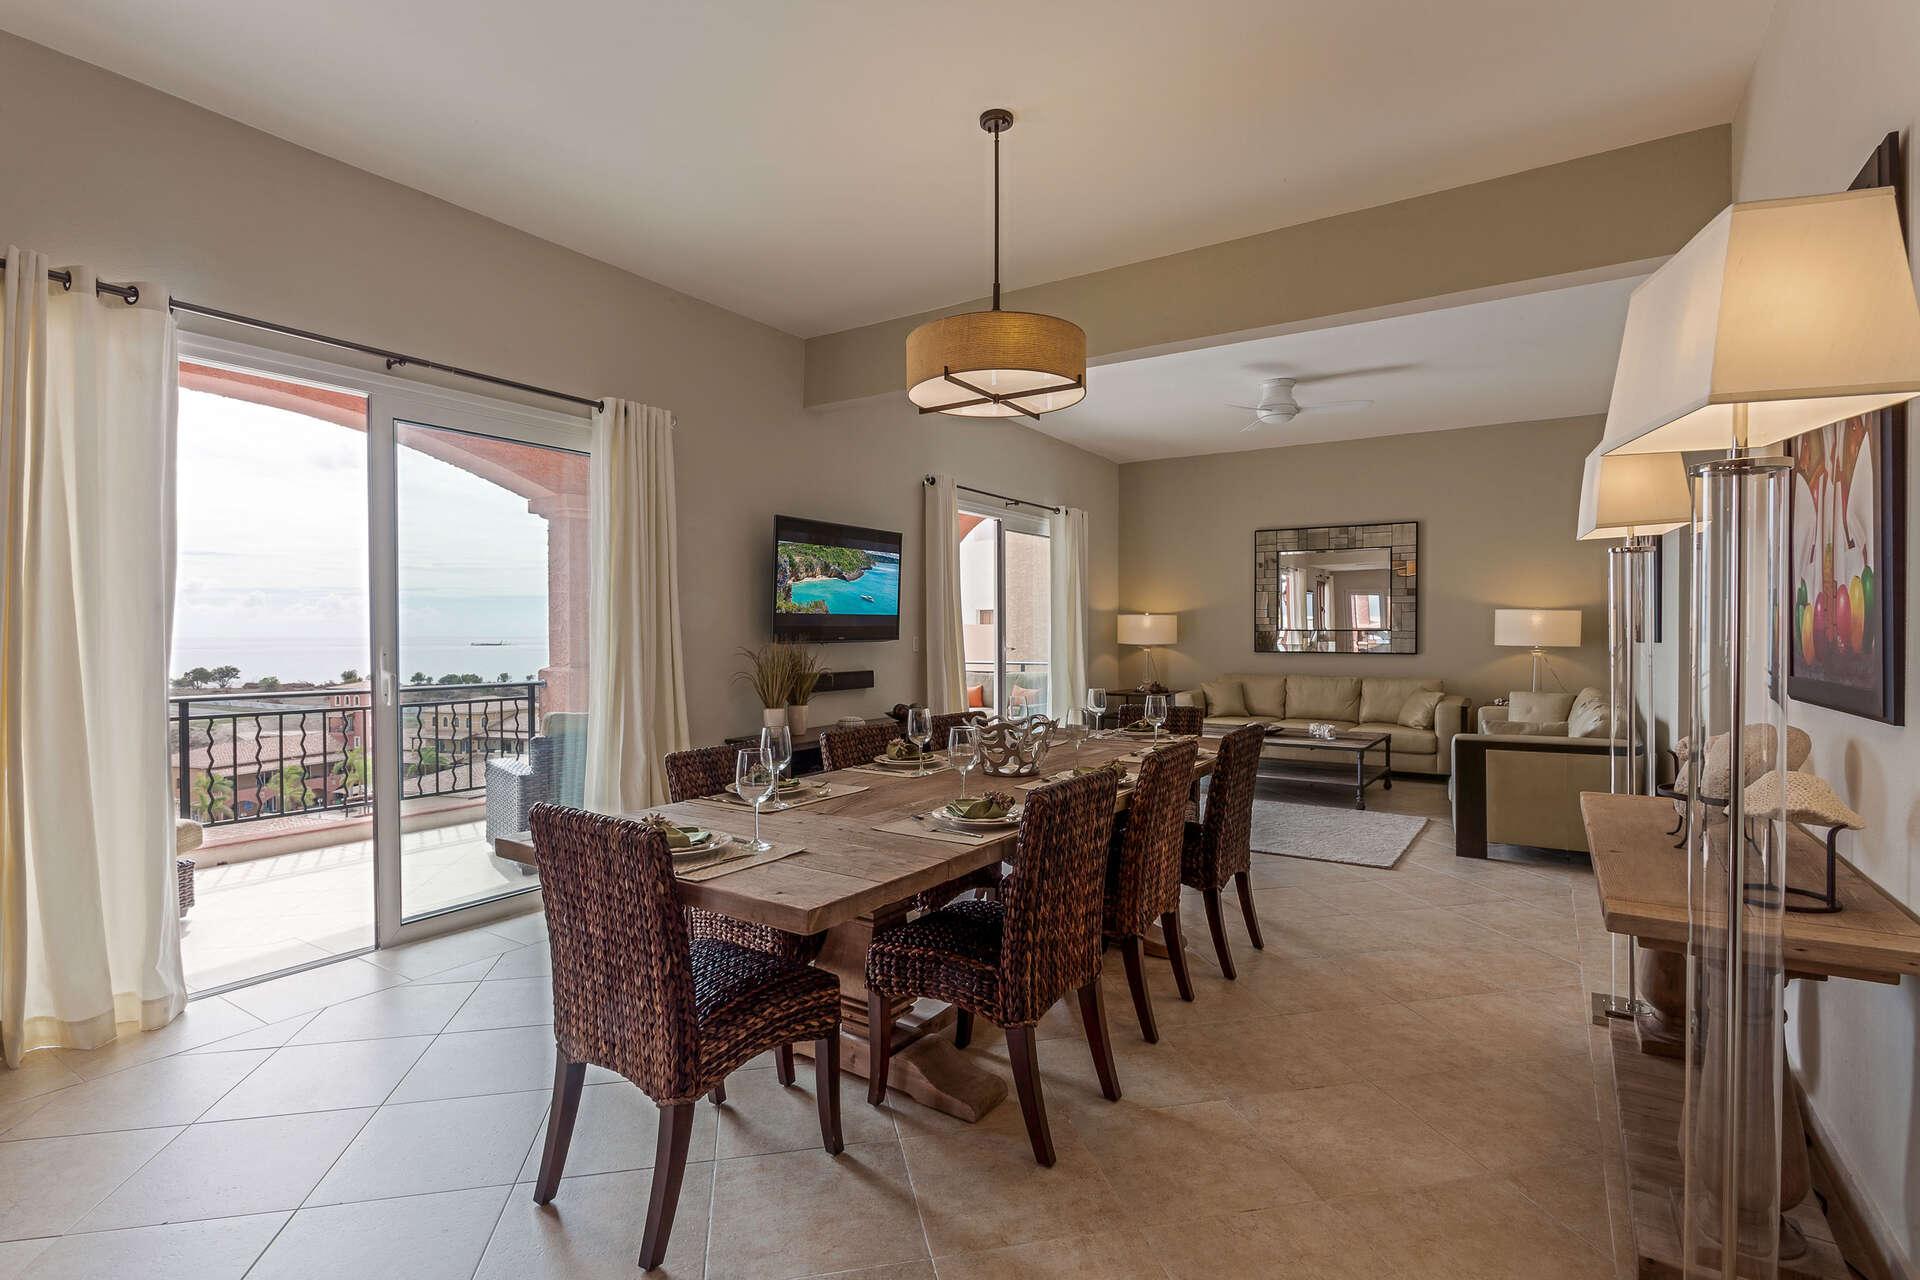 Luxury villa rentals caribbean - St martin - Sint maarten - Porto cupecoy - Corfu - Image 1/13